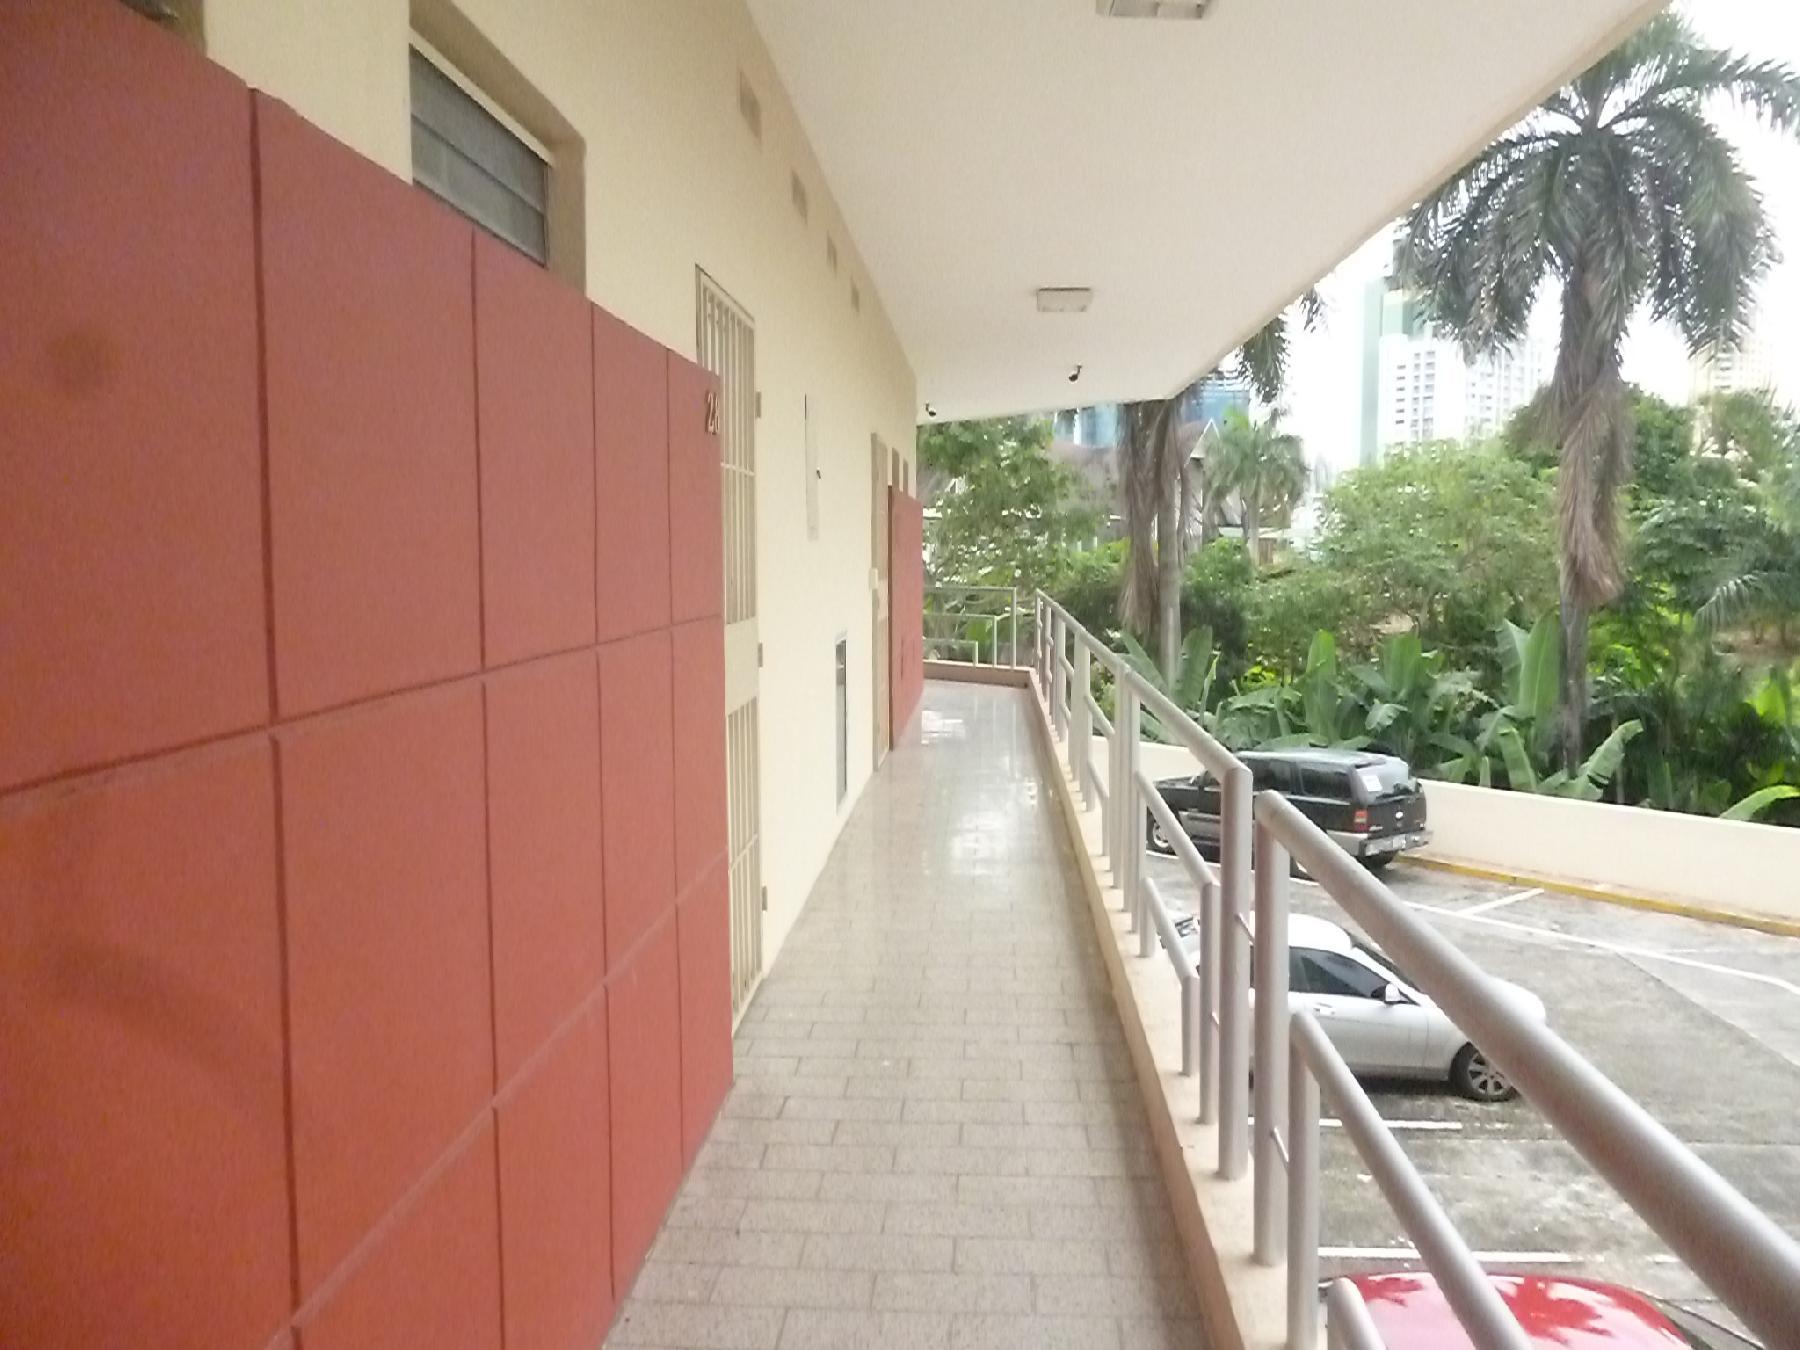 PANAMA, PAITILLA, IN CENTRO COMERCIAL BALBOA 40 m2 OFFICE